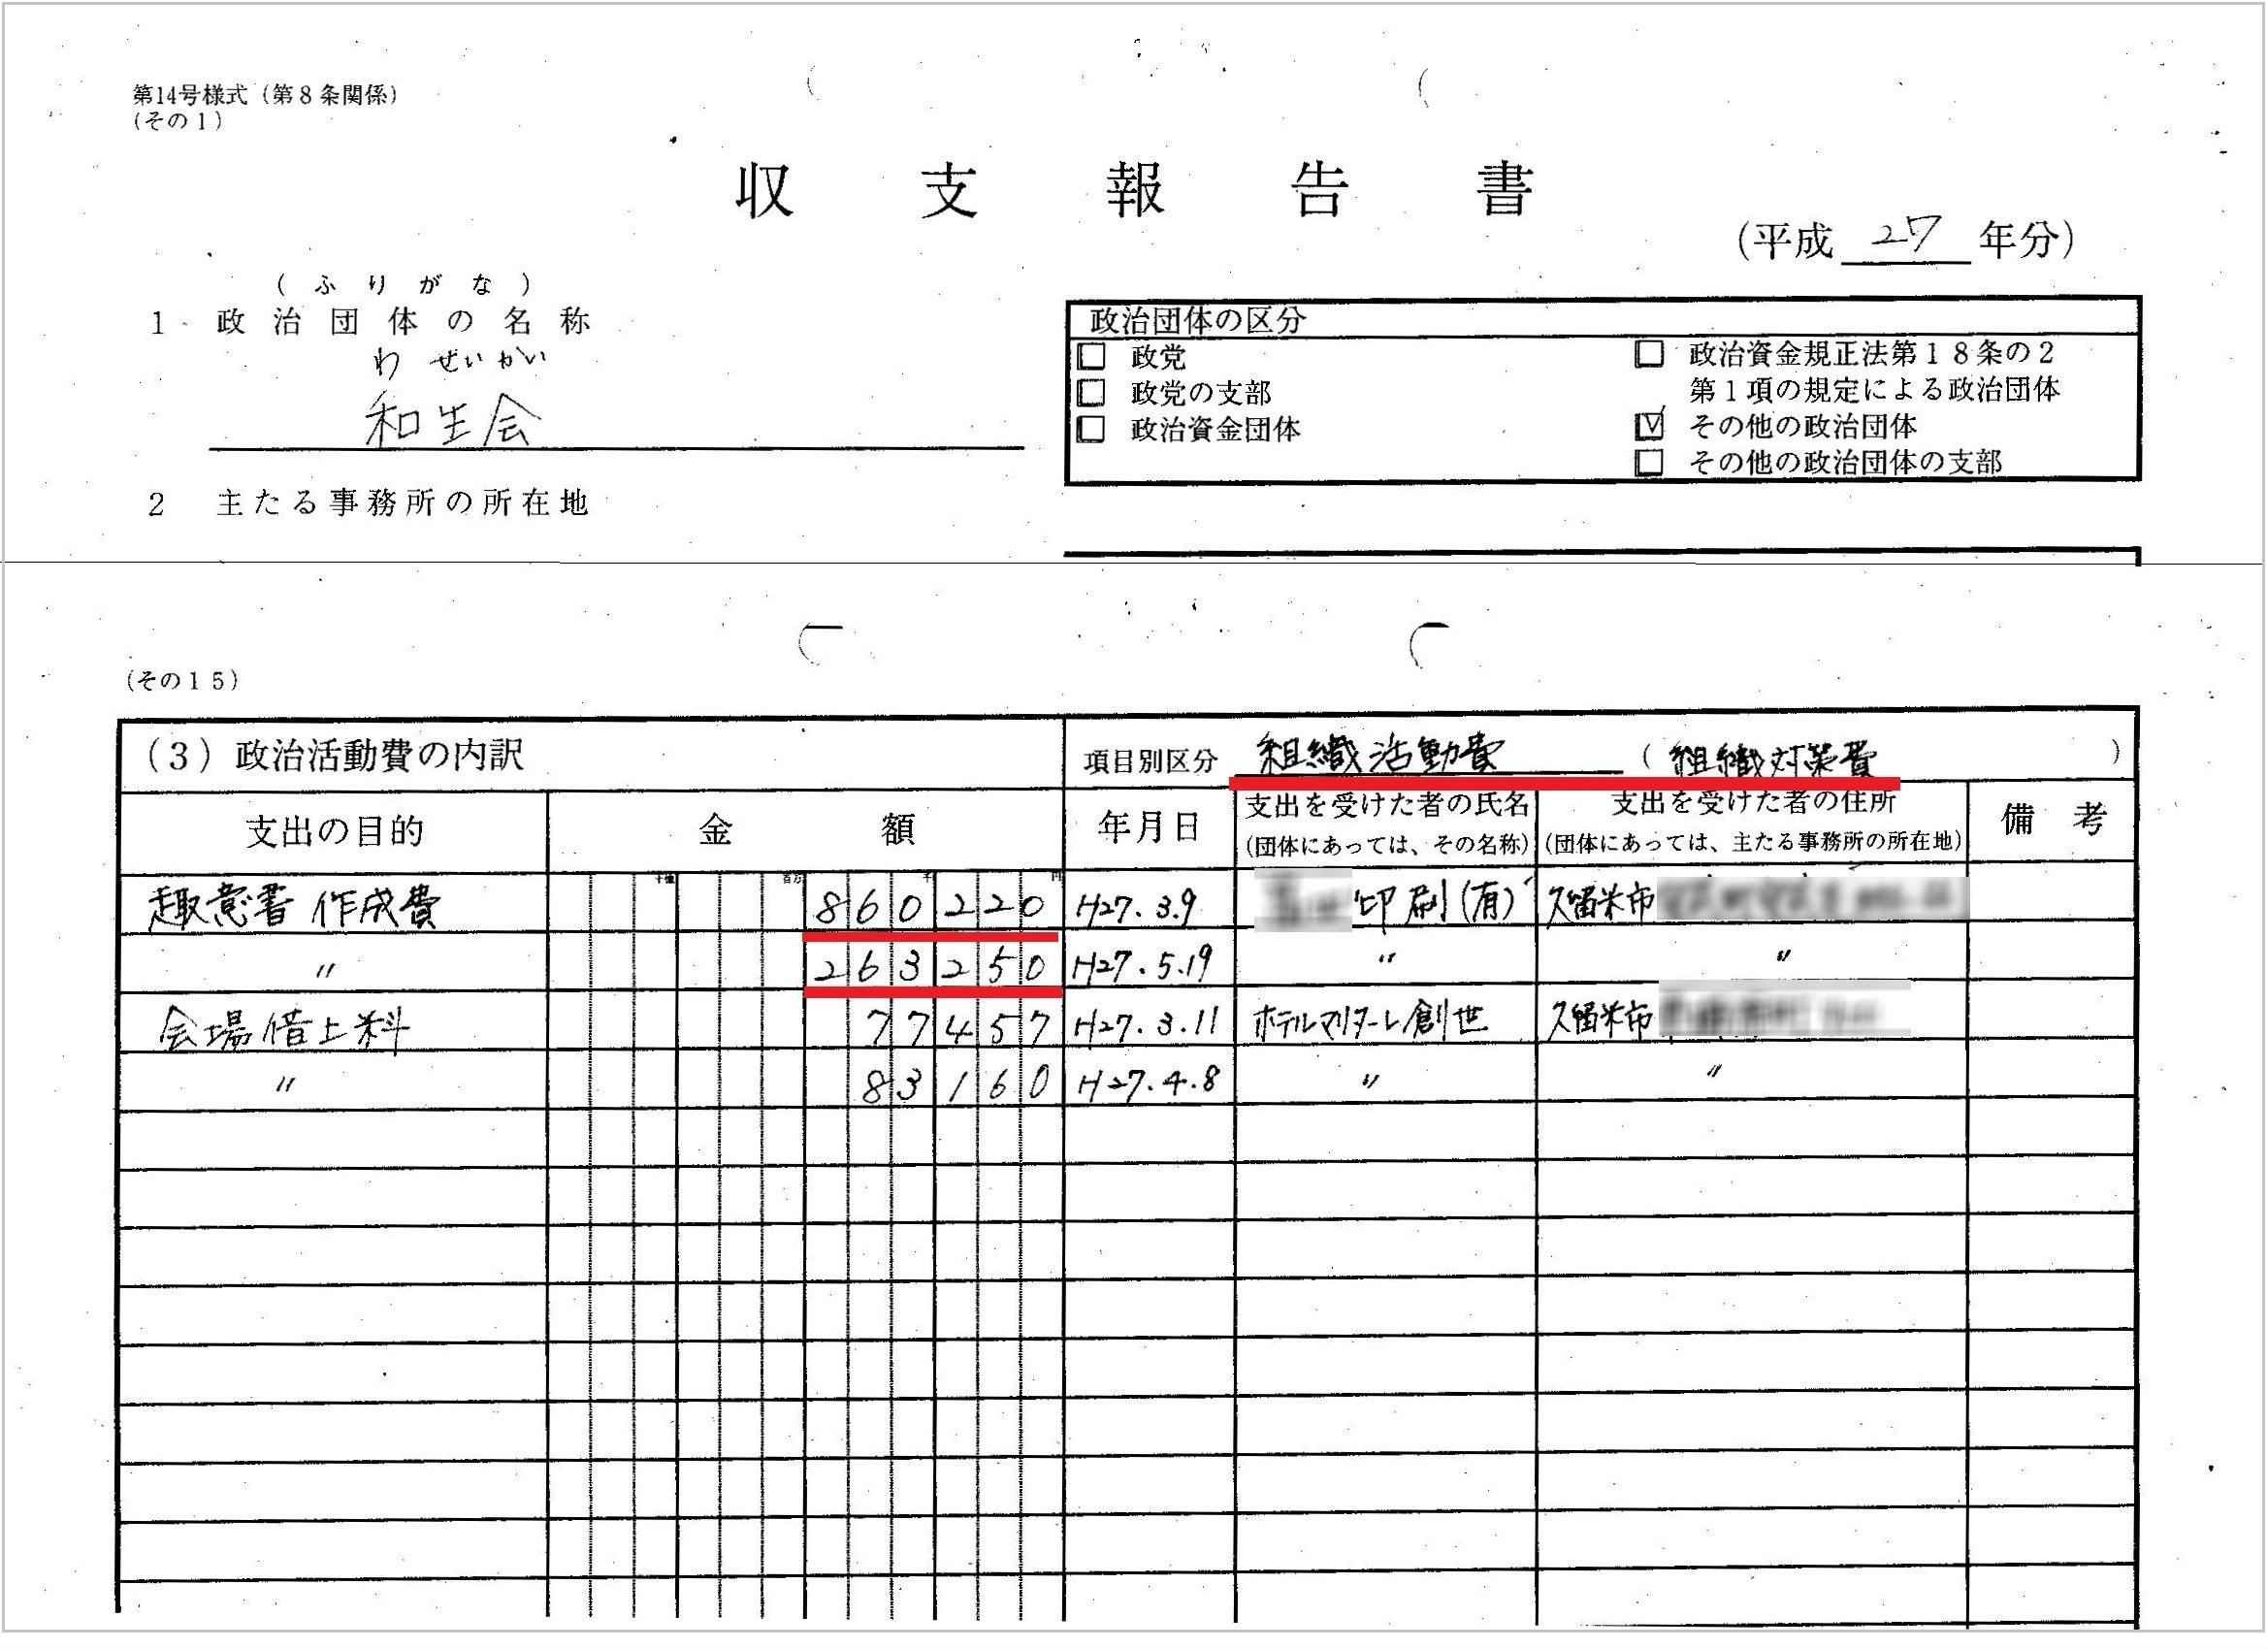 http://hunter-investigate.jp/news/0eee25a4856149cb27c8778feddd0ee6cc58873b.jpg